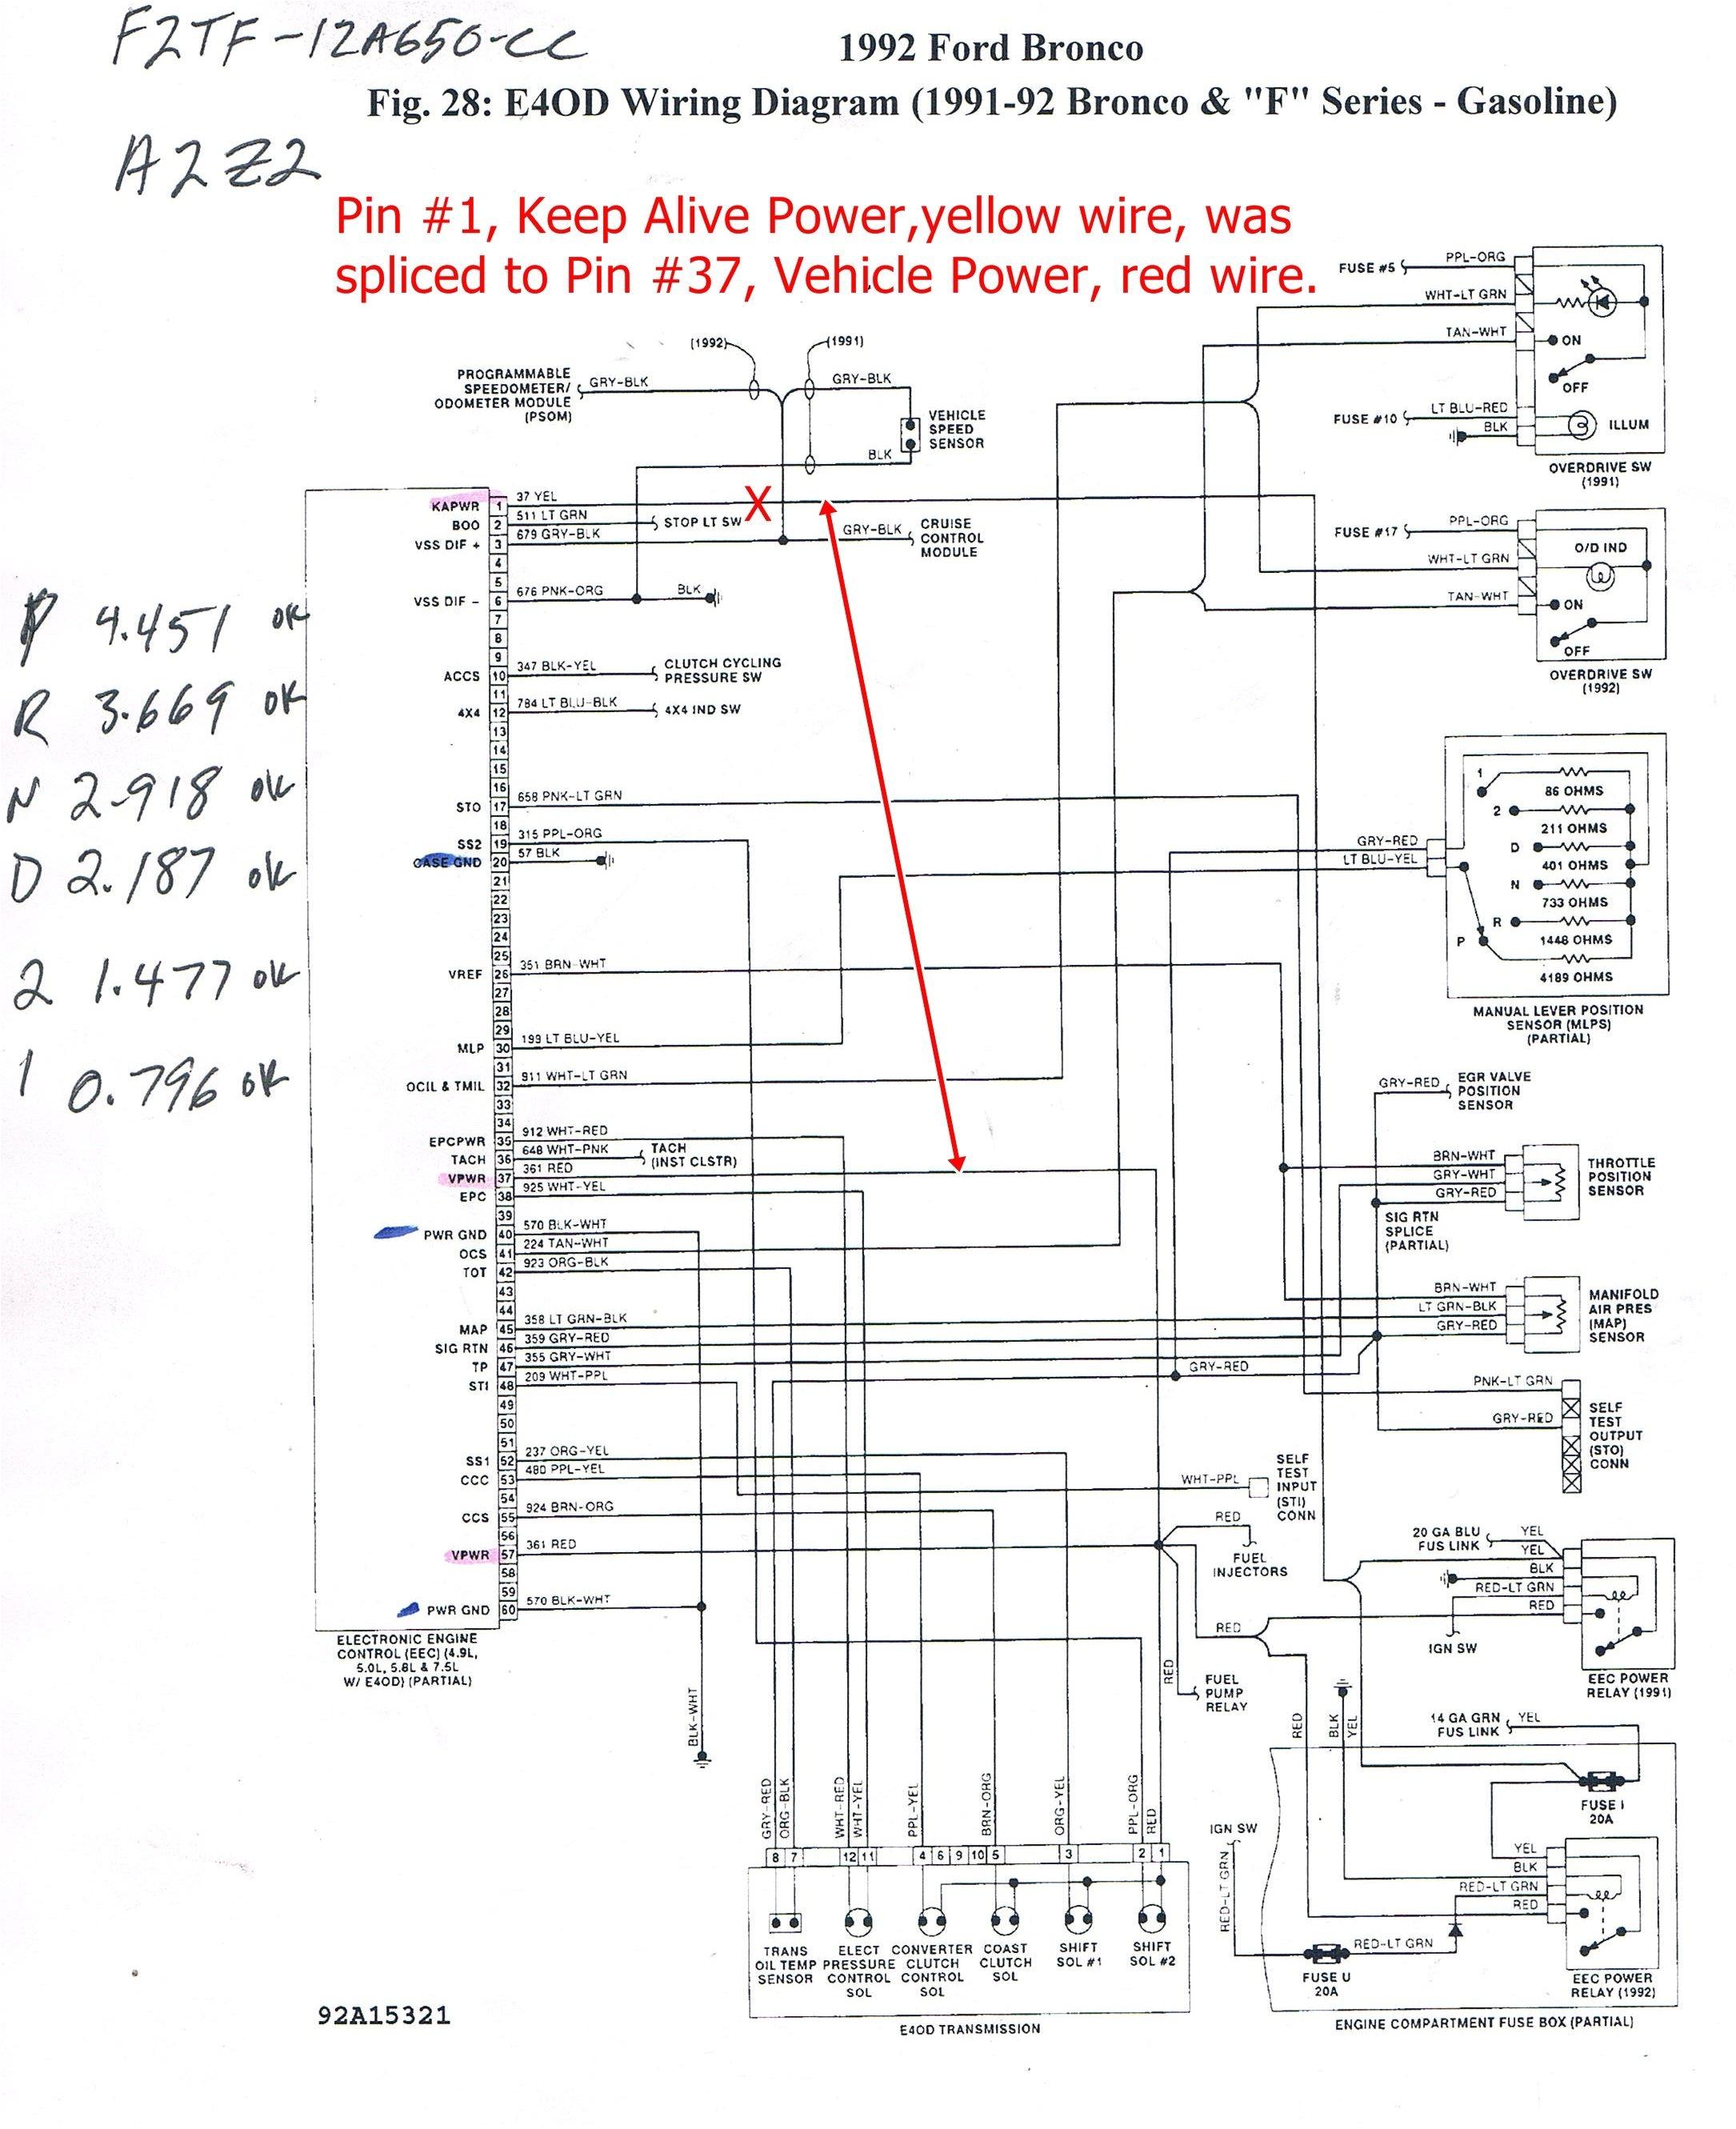 wiring diagram as well dodge ram 1500 on 2002 dodge ram 1500 power 2002 dodge ram 1500 stereo wiring diagram